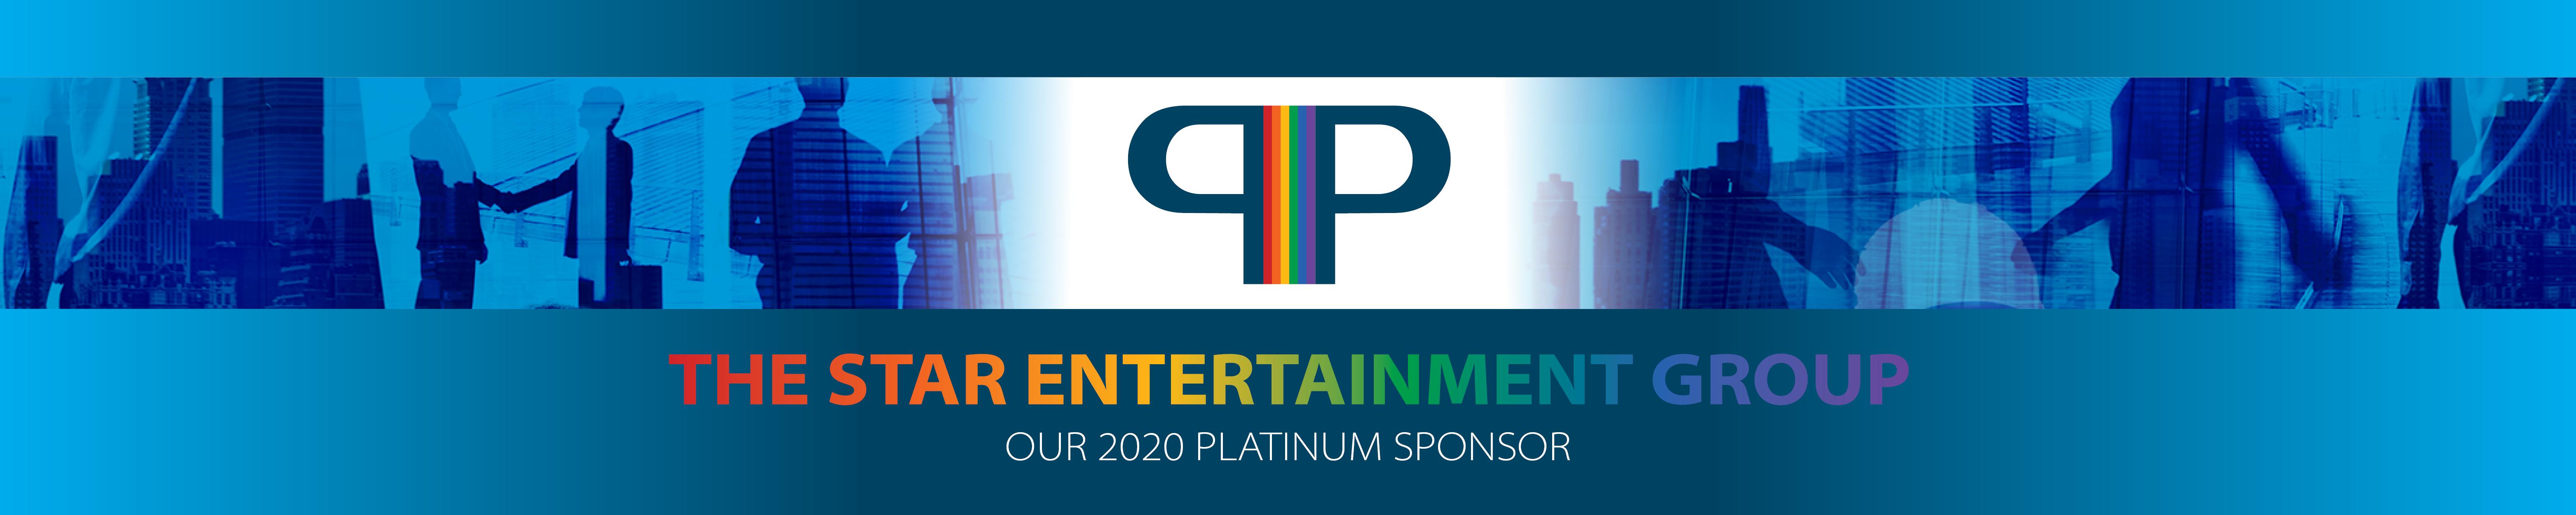 PIP_Conference_PlatinumSponsor